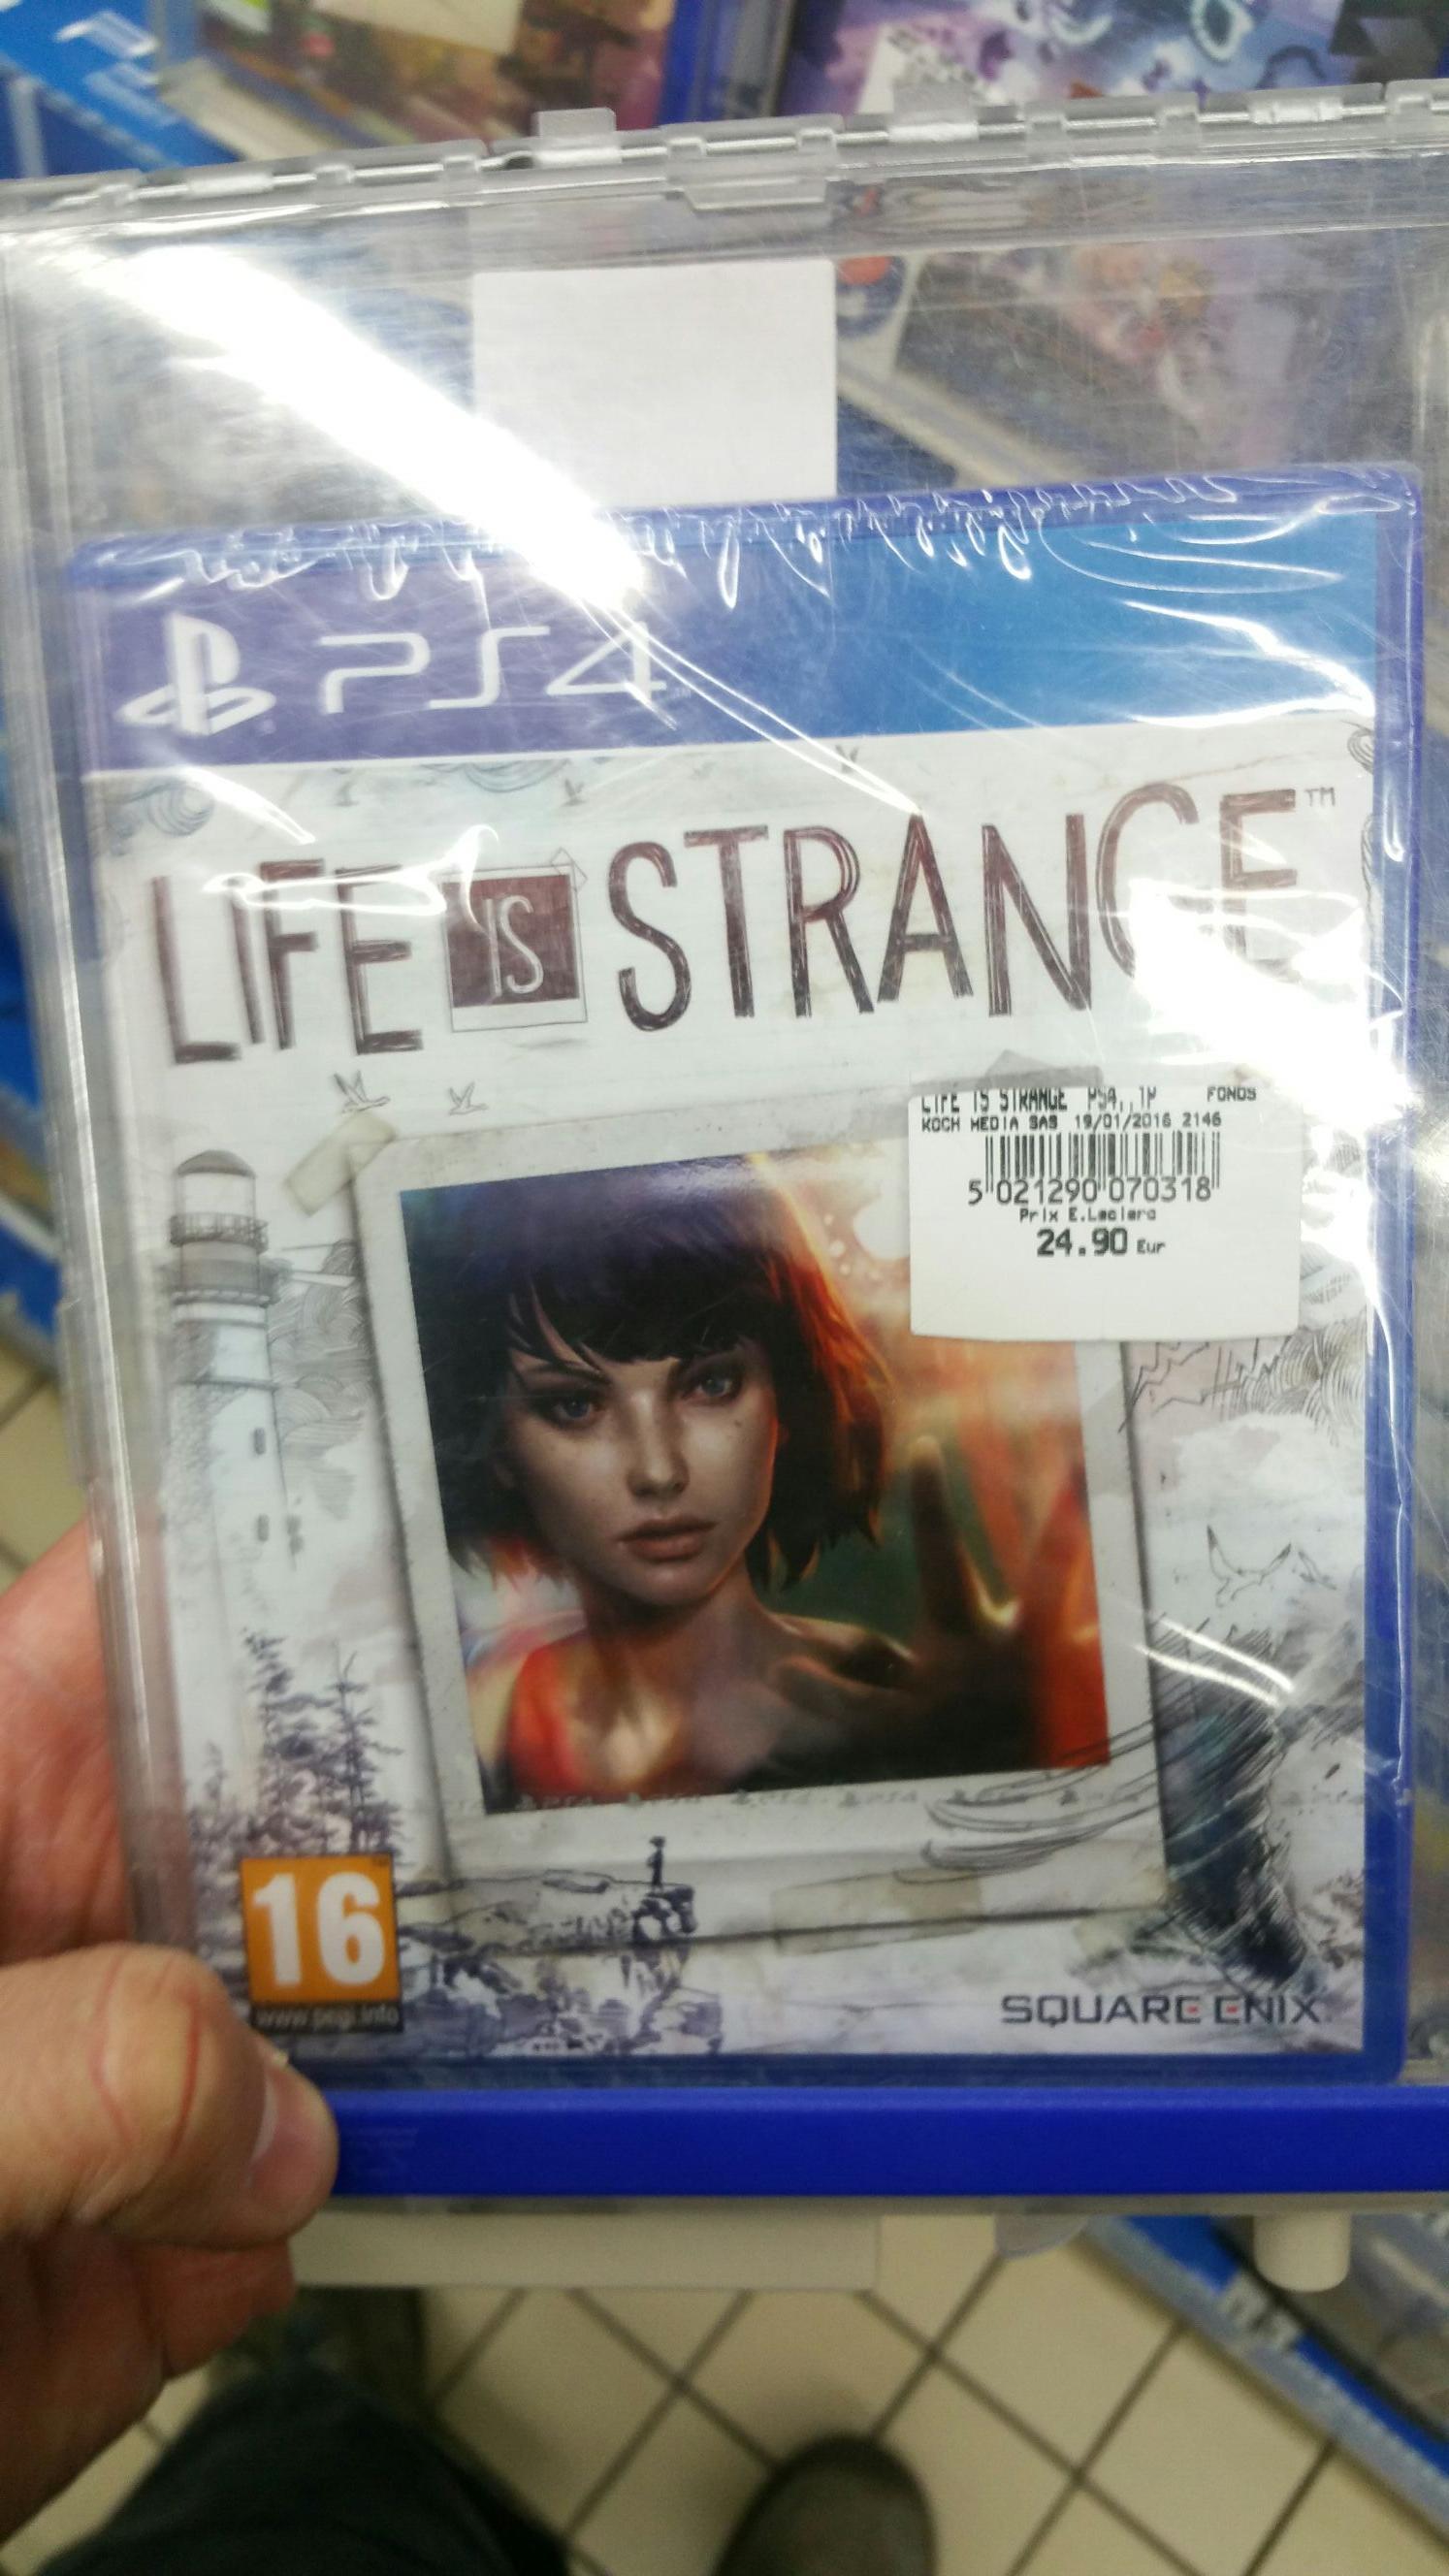 Life is Strange sur PS4